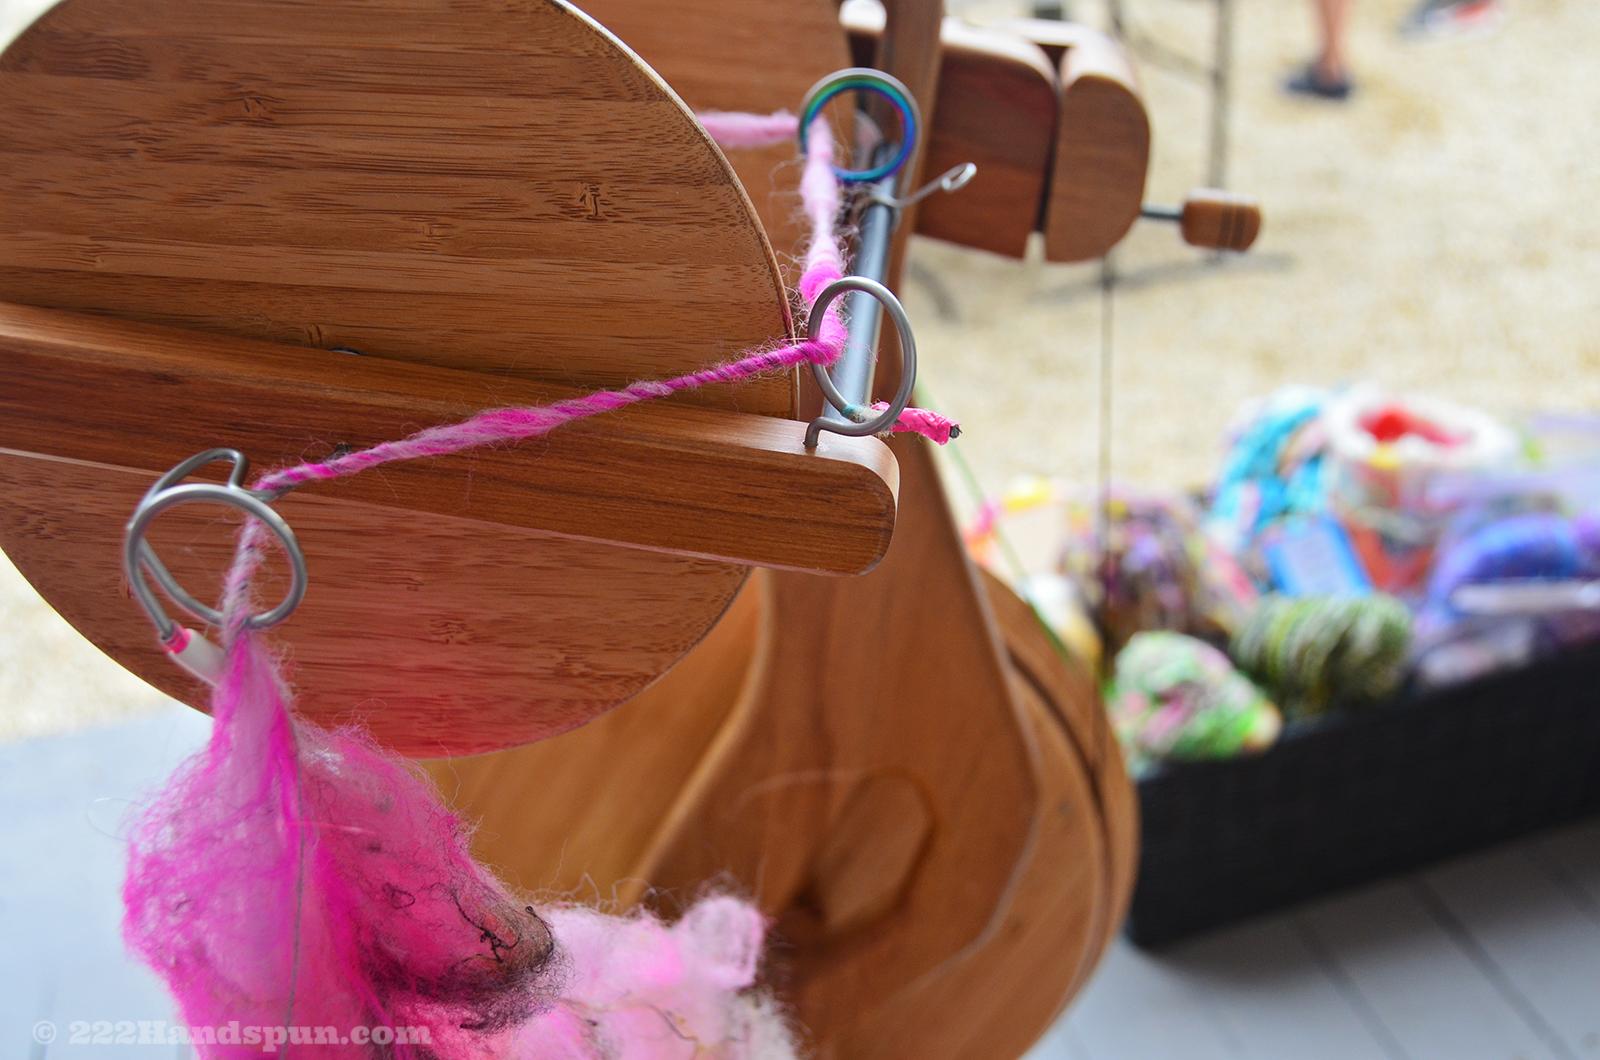 Me spinning corespun art yarn on my Majacraft Aura wheel